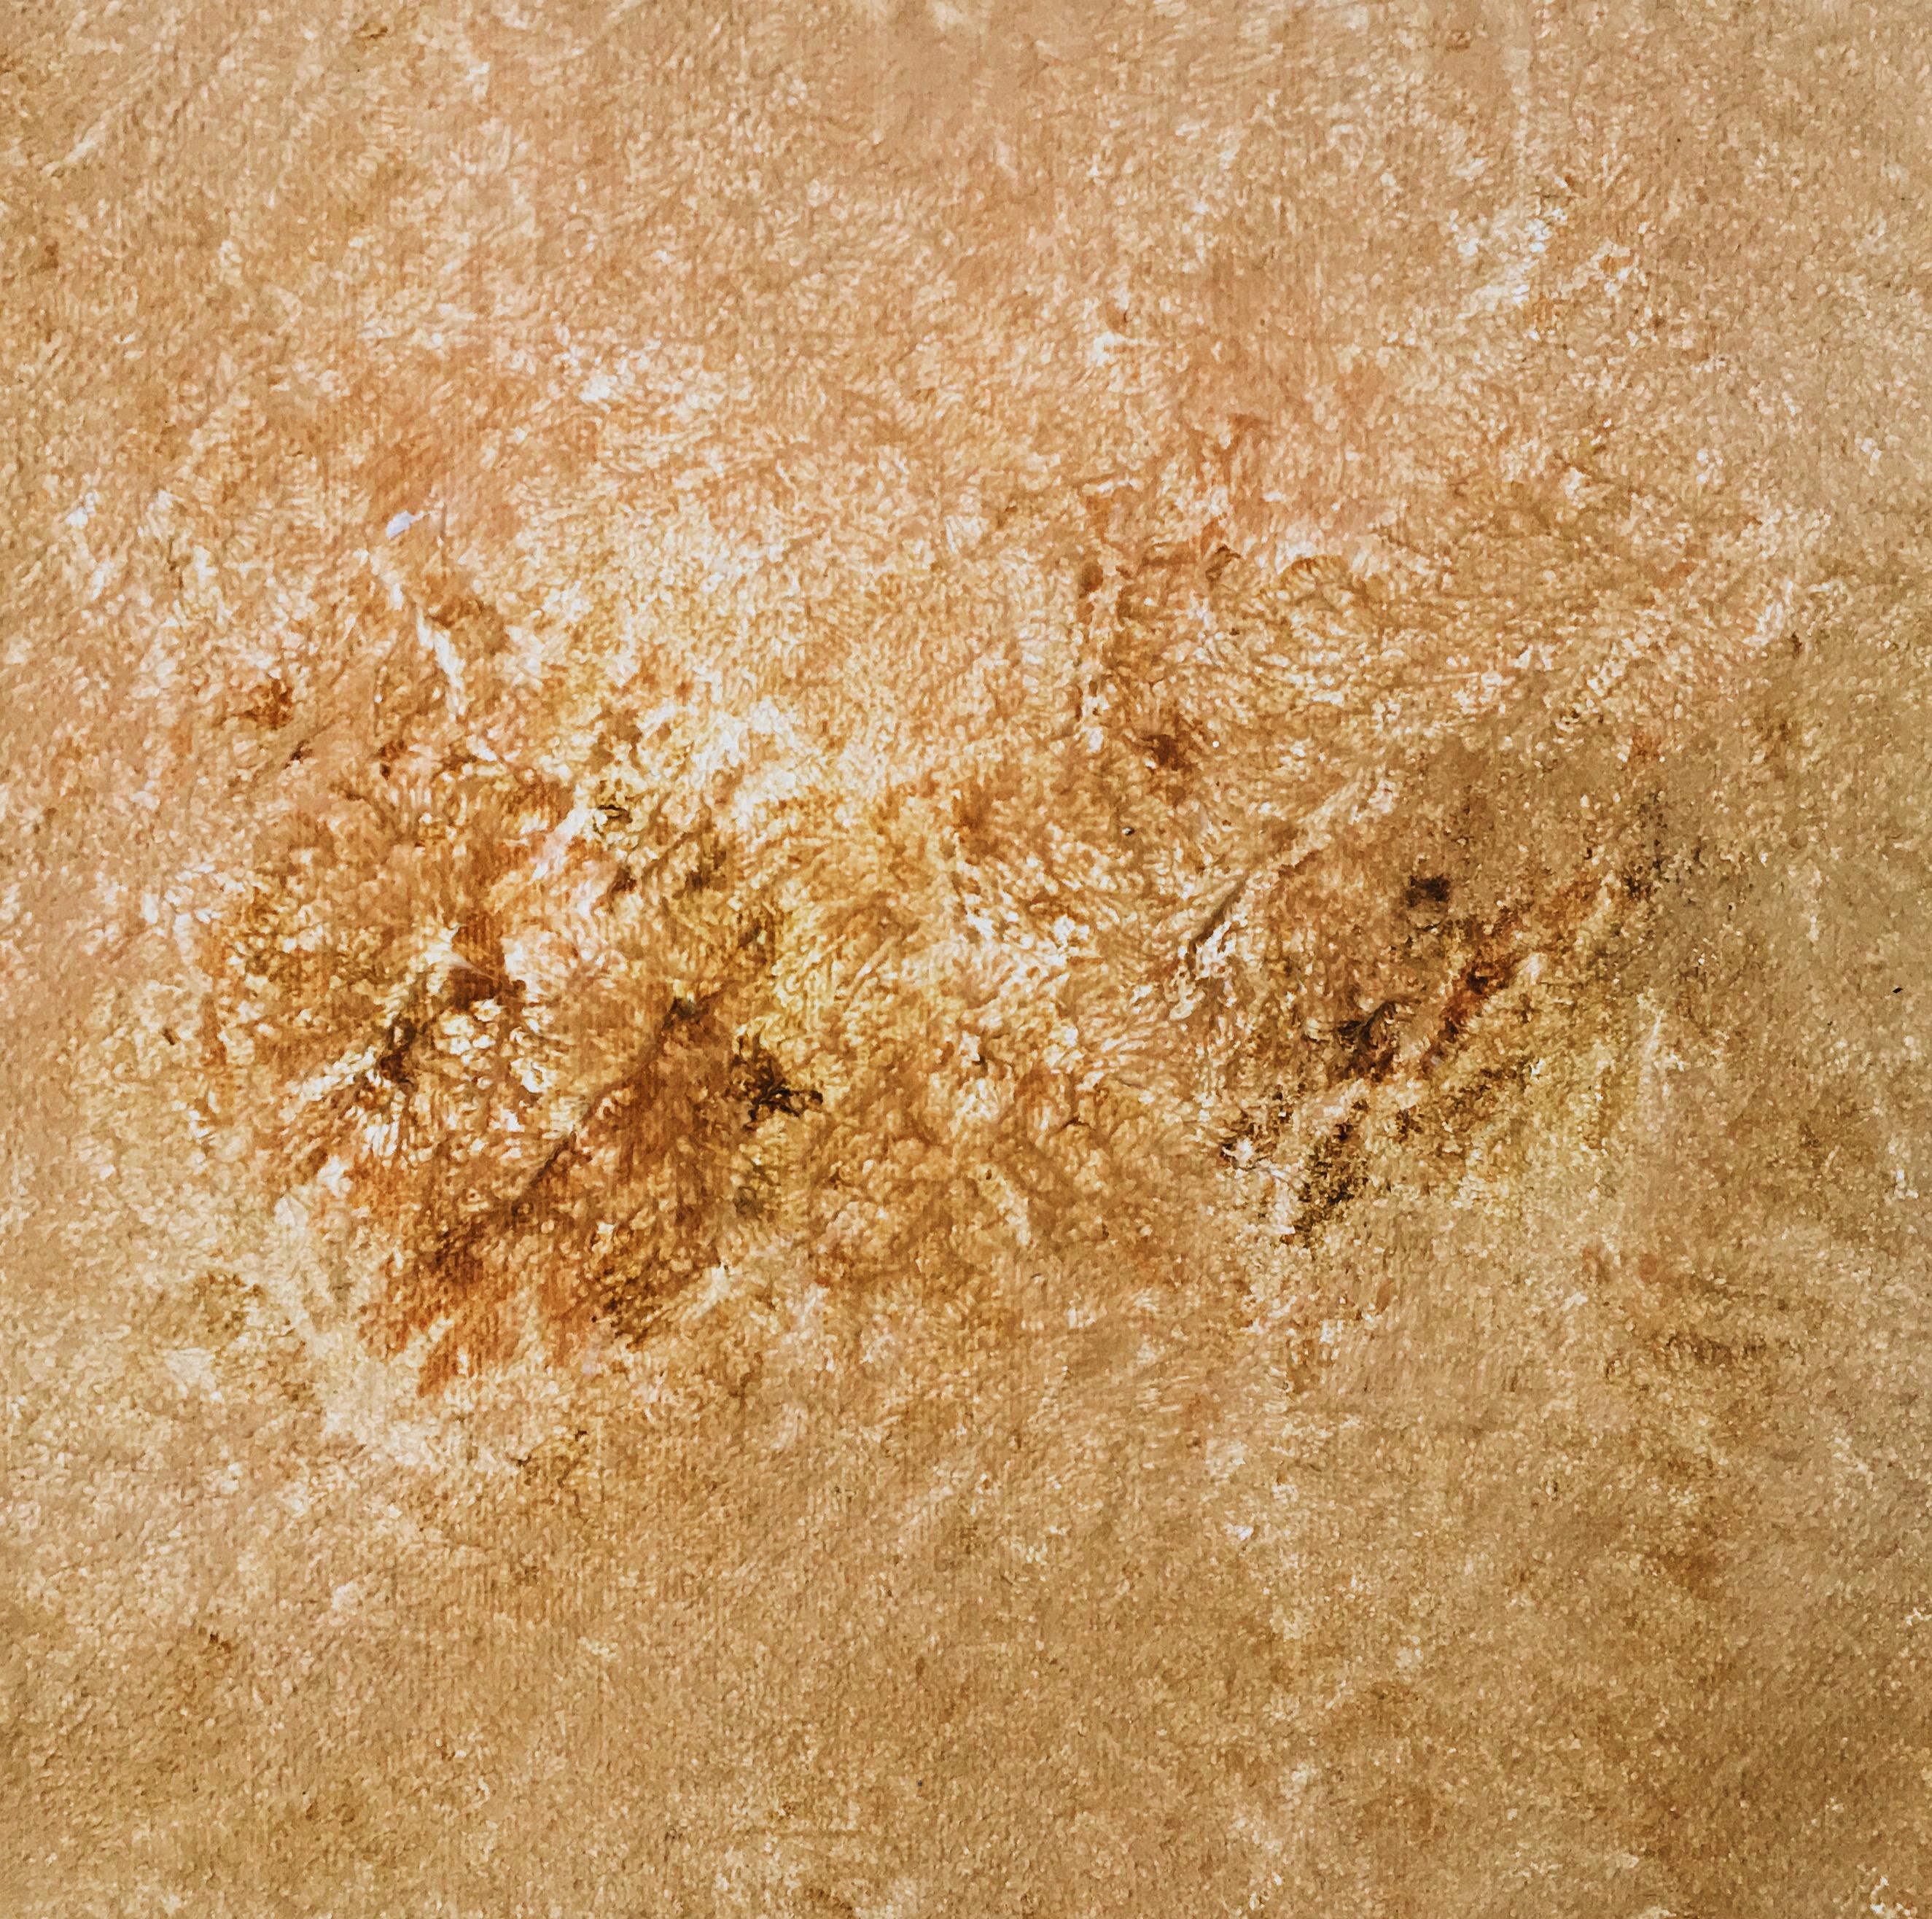 Marine Bonzom - Artiste Peintre Biarritz - 37